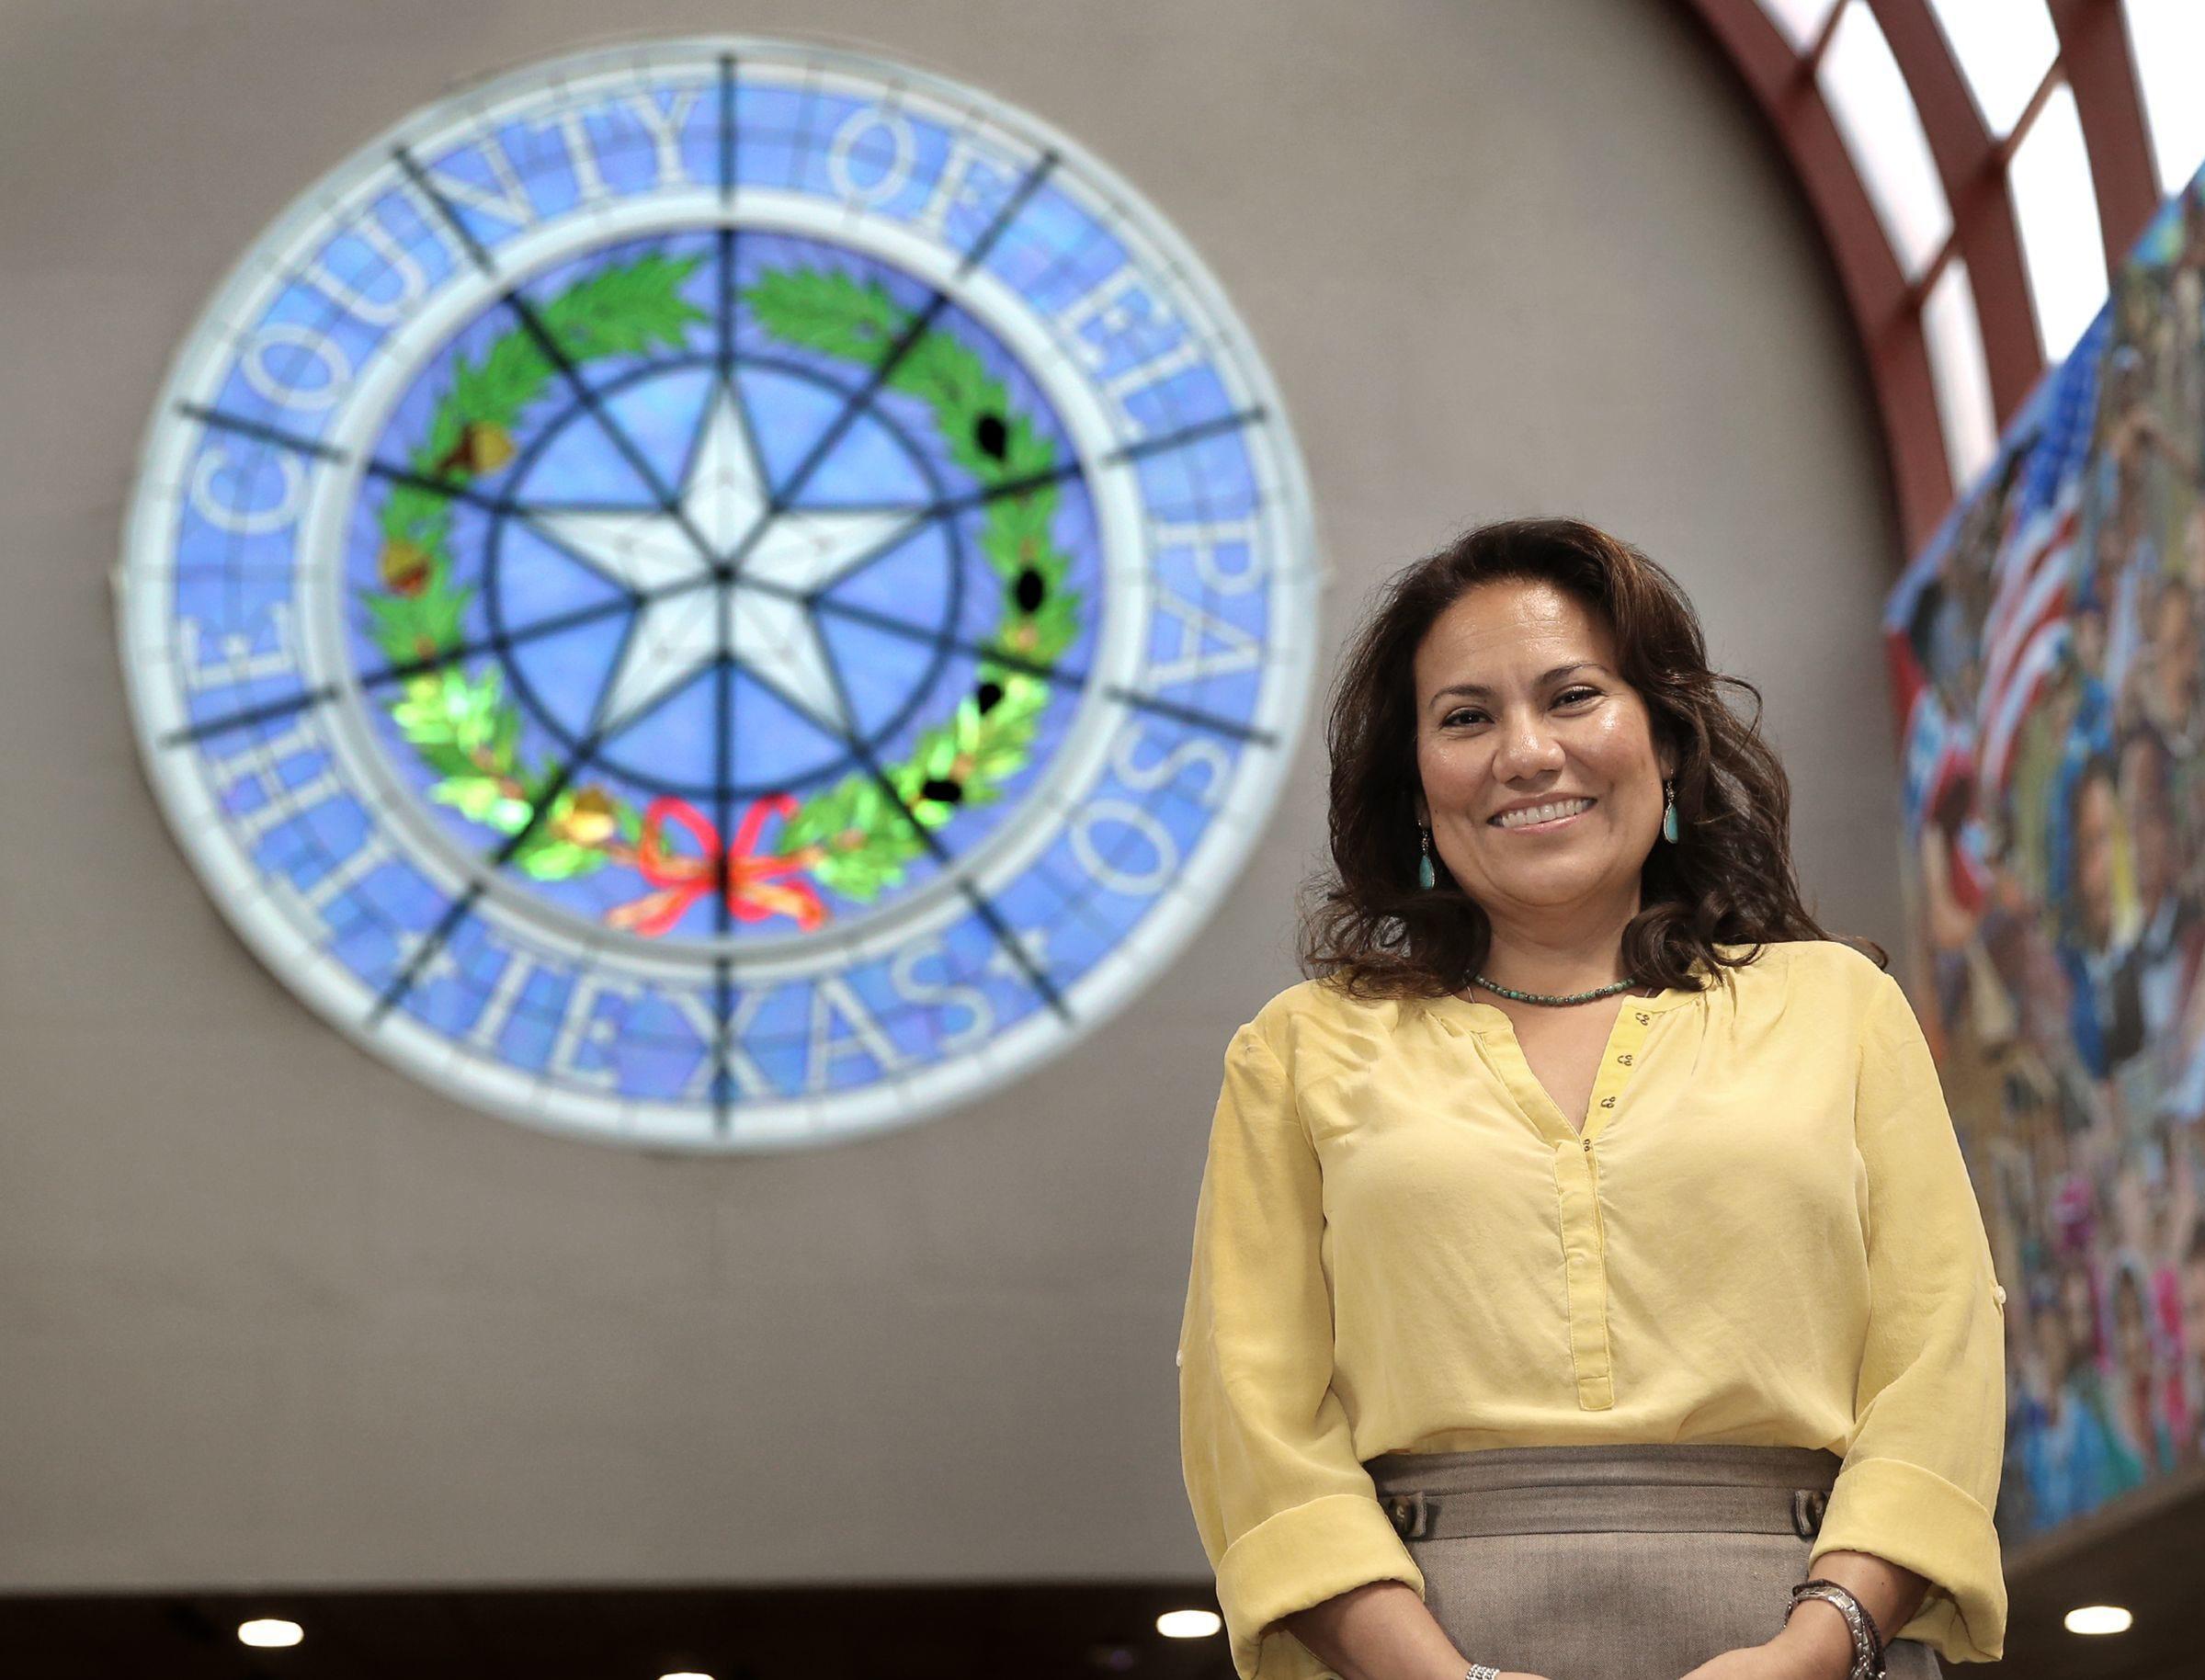 El Paso County Judge Veronica Escobar announced her resignation in late August.